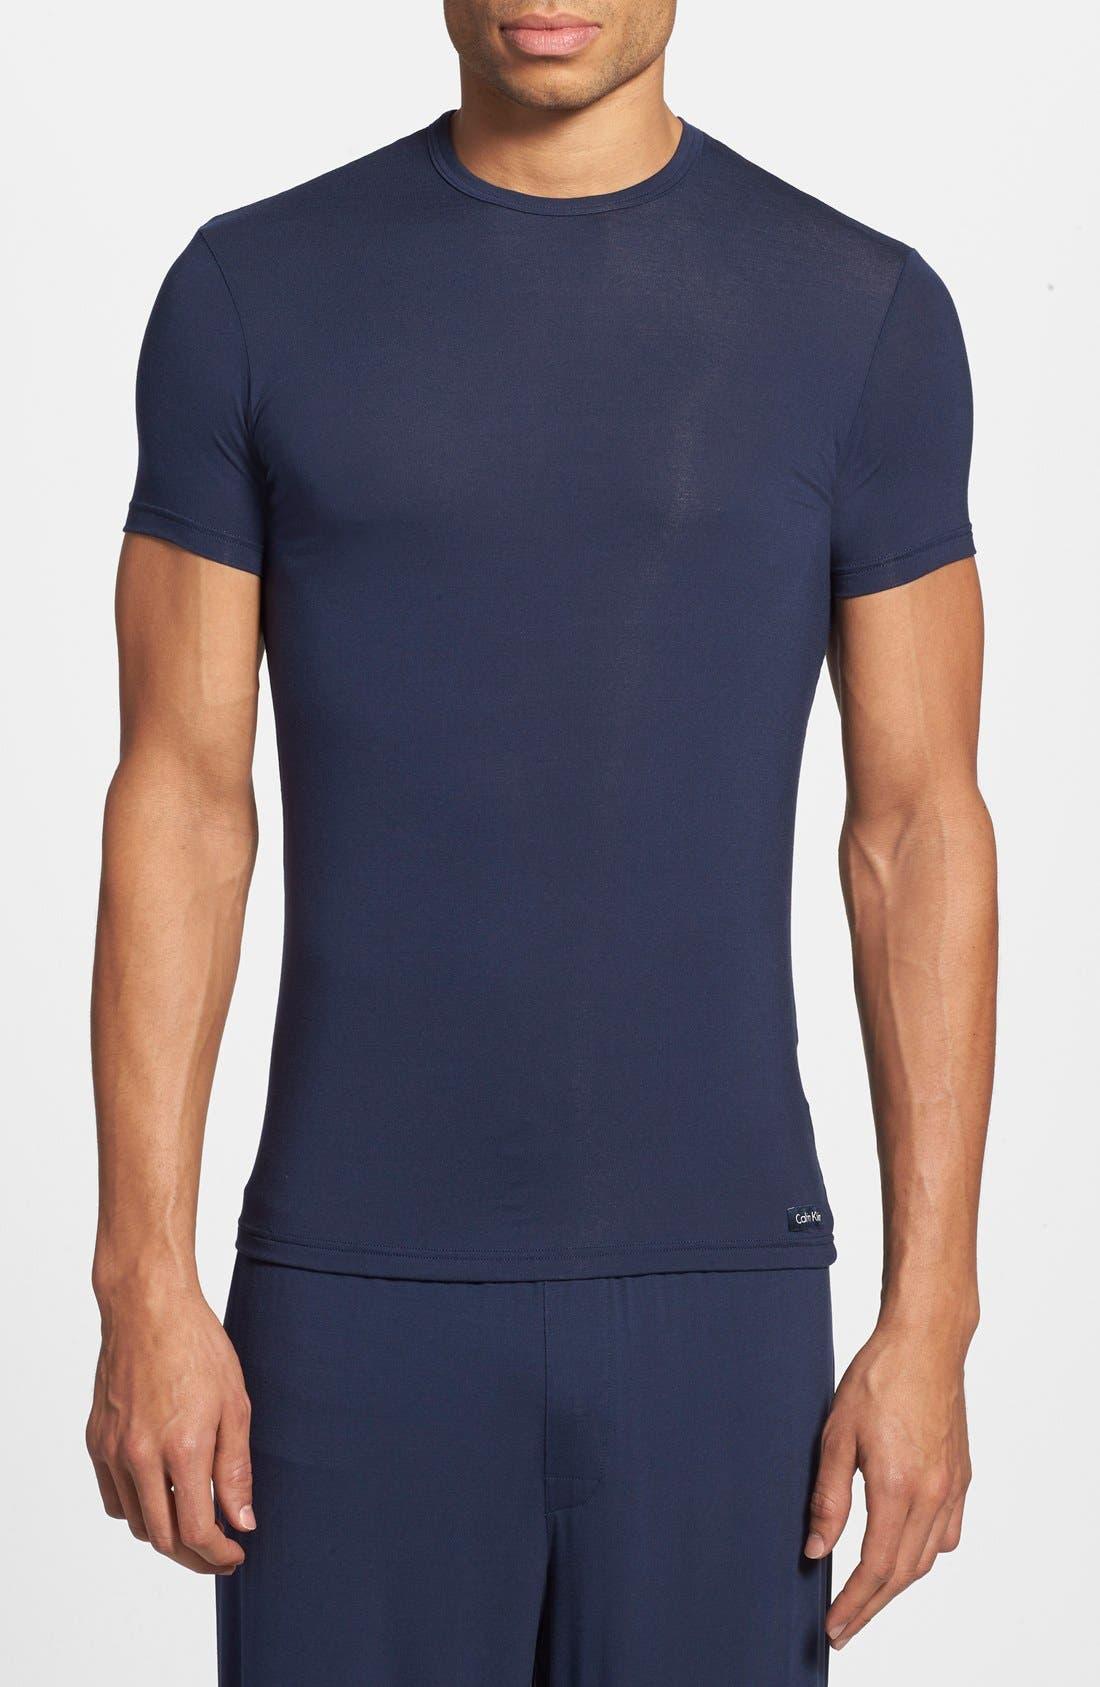 'U5551' Modal Blend Crewneck T-Shirt,                         Main,                         color, Blue Shadow